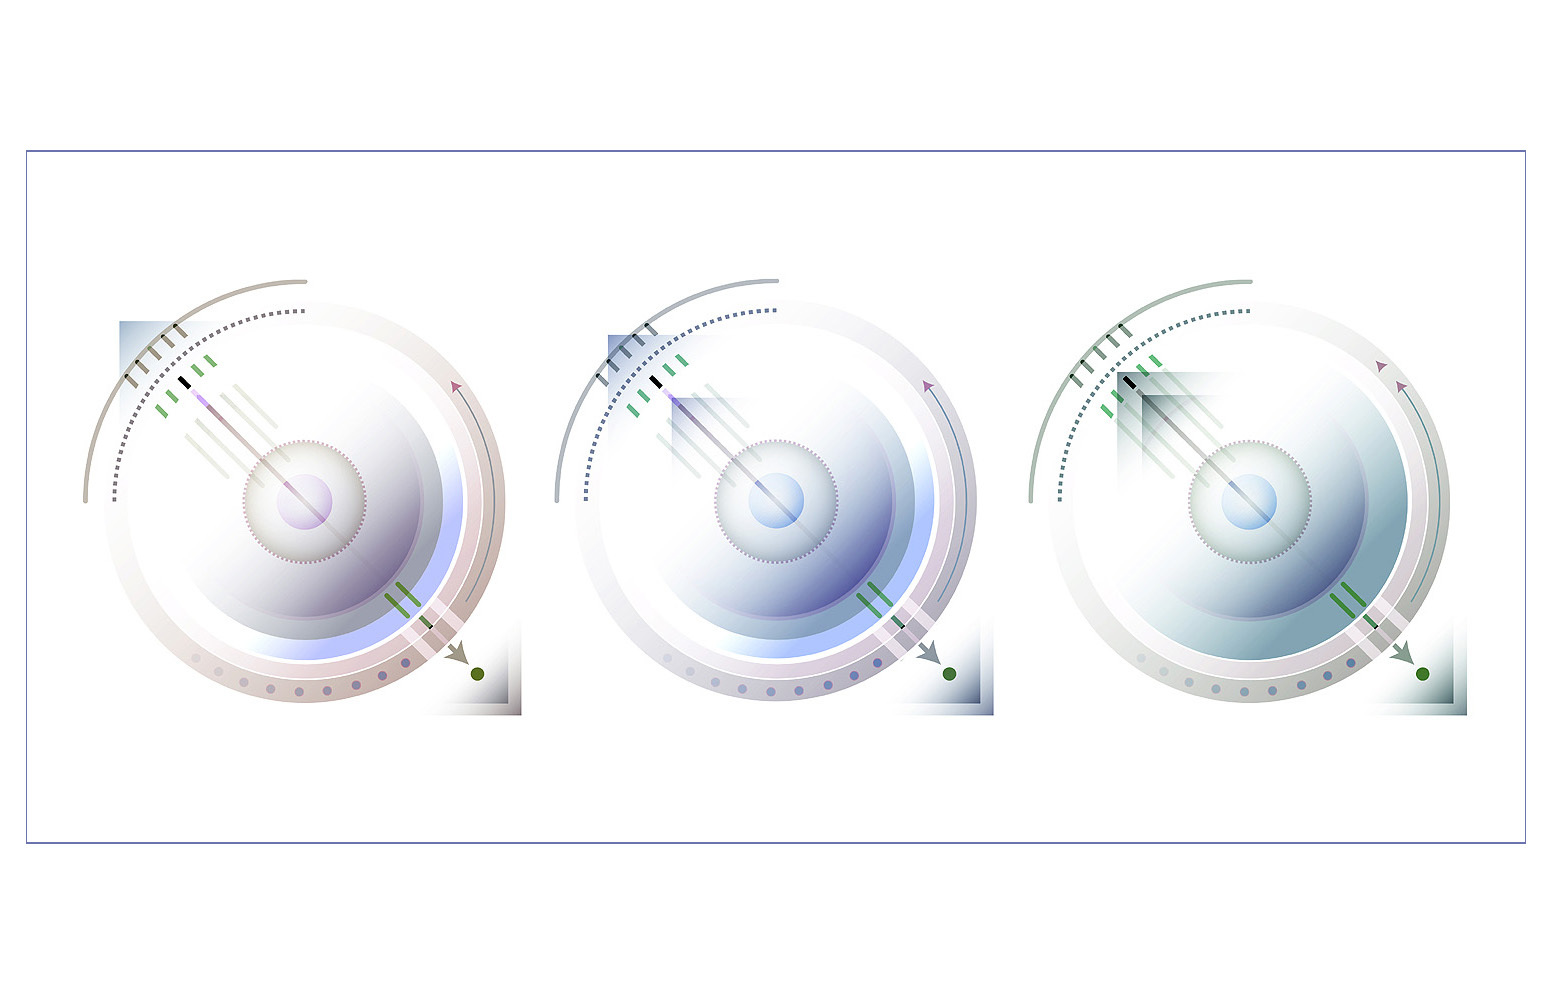 *Circles_Squares_lines_Gradient* Digital Illustration JPEG Image Download - $3.94